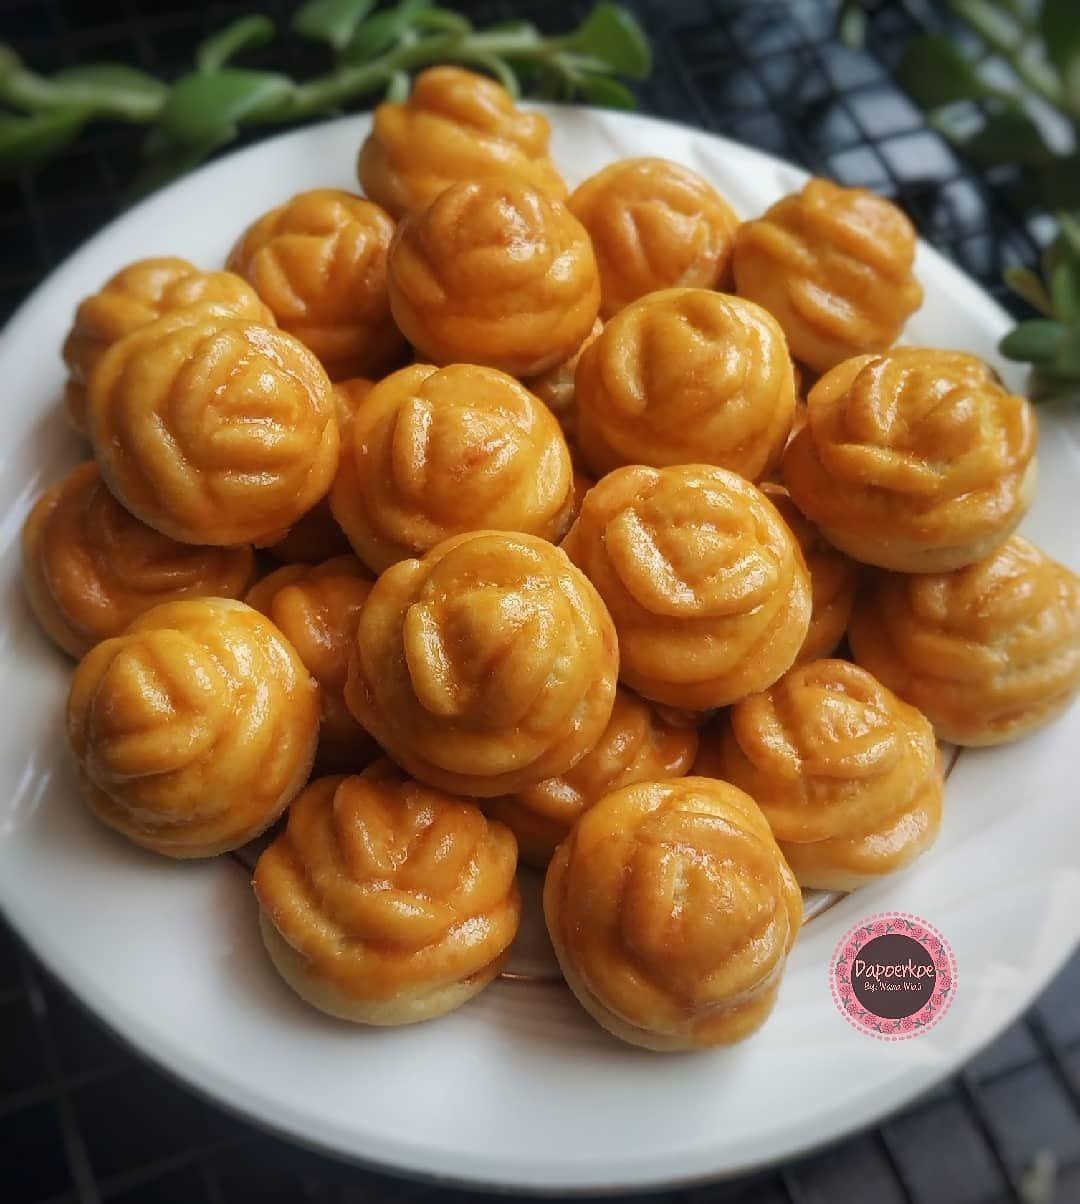 200 G Margarin Dicampur Butter Saya 125 Royal Palmia Food Butter Fruit